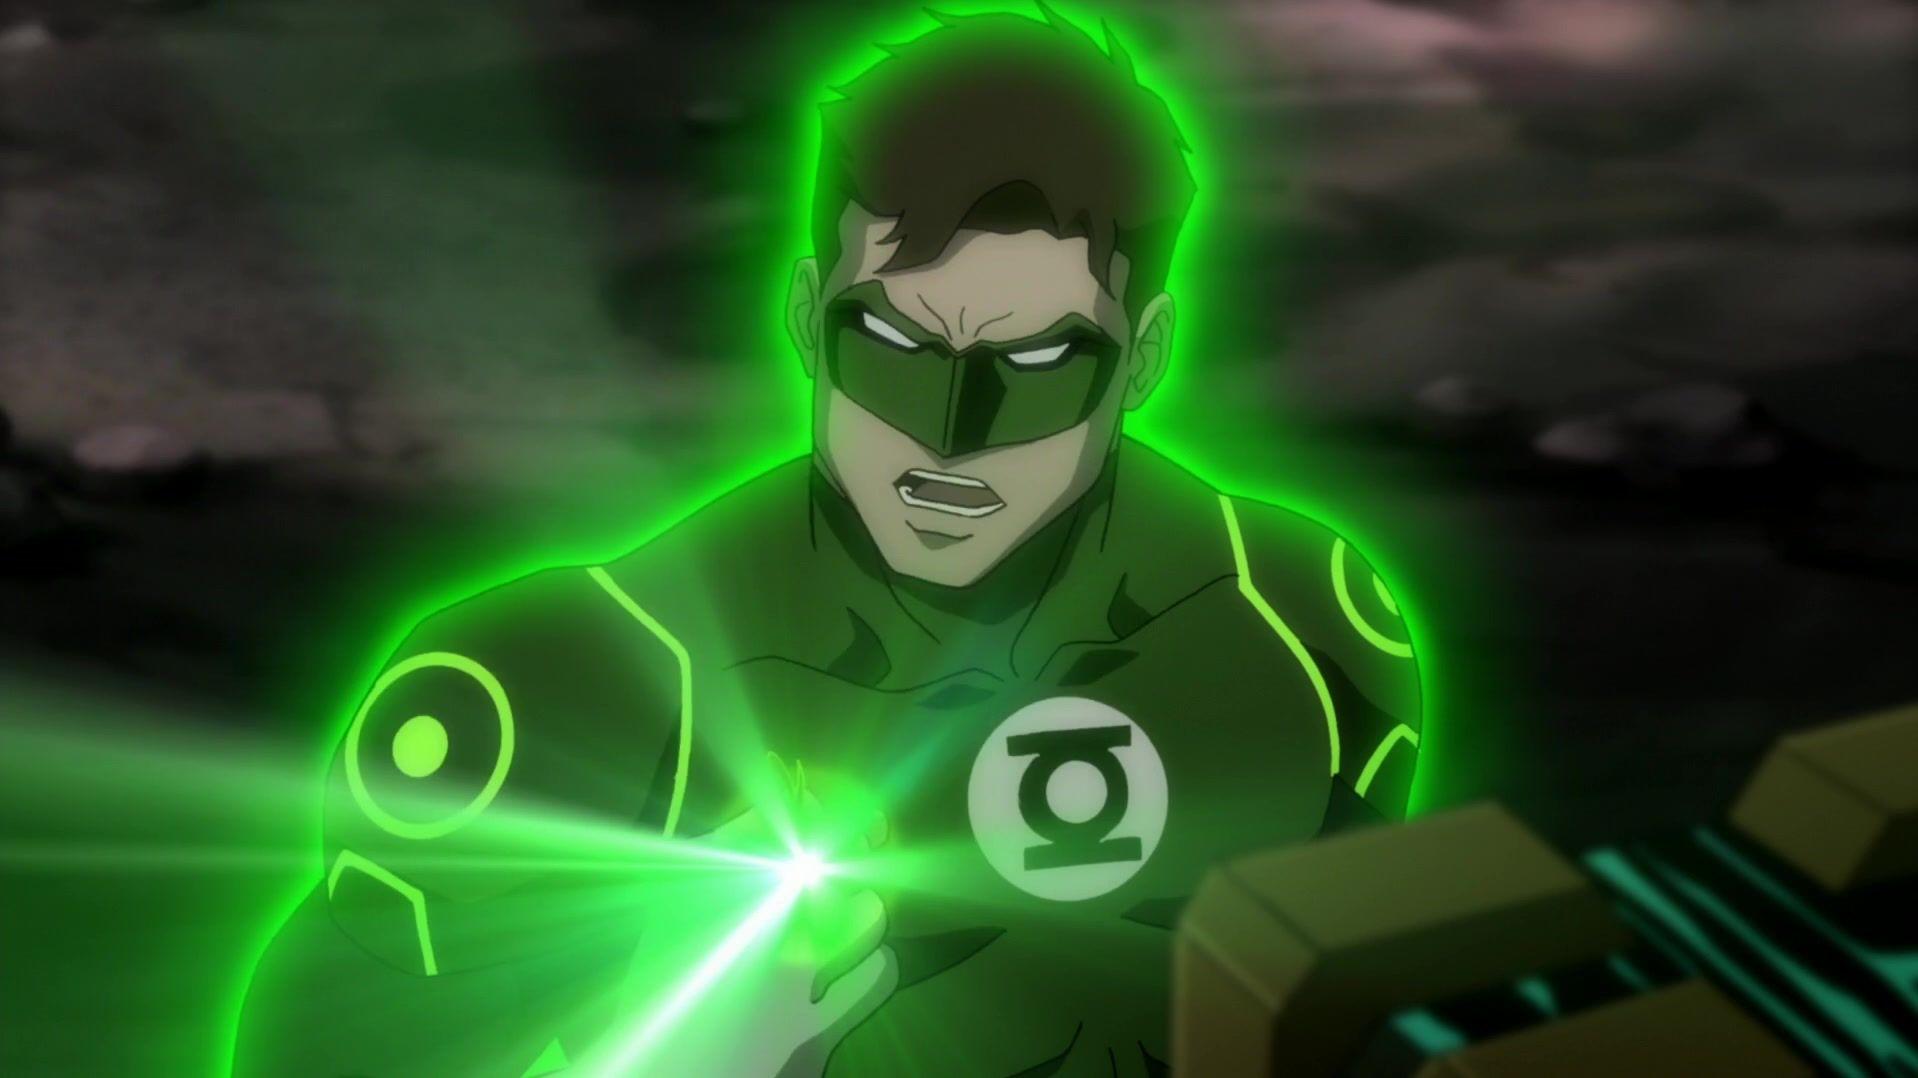 Justice League War 2014 Green Lantern And Batman Green Lantern Green Lantern Hal Jordan Green Lantern Corps